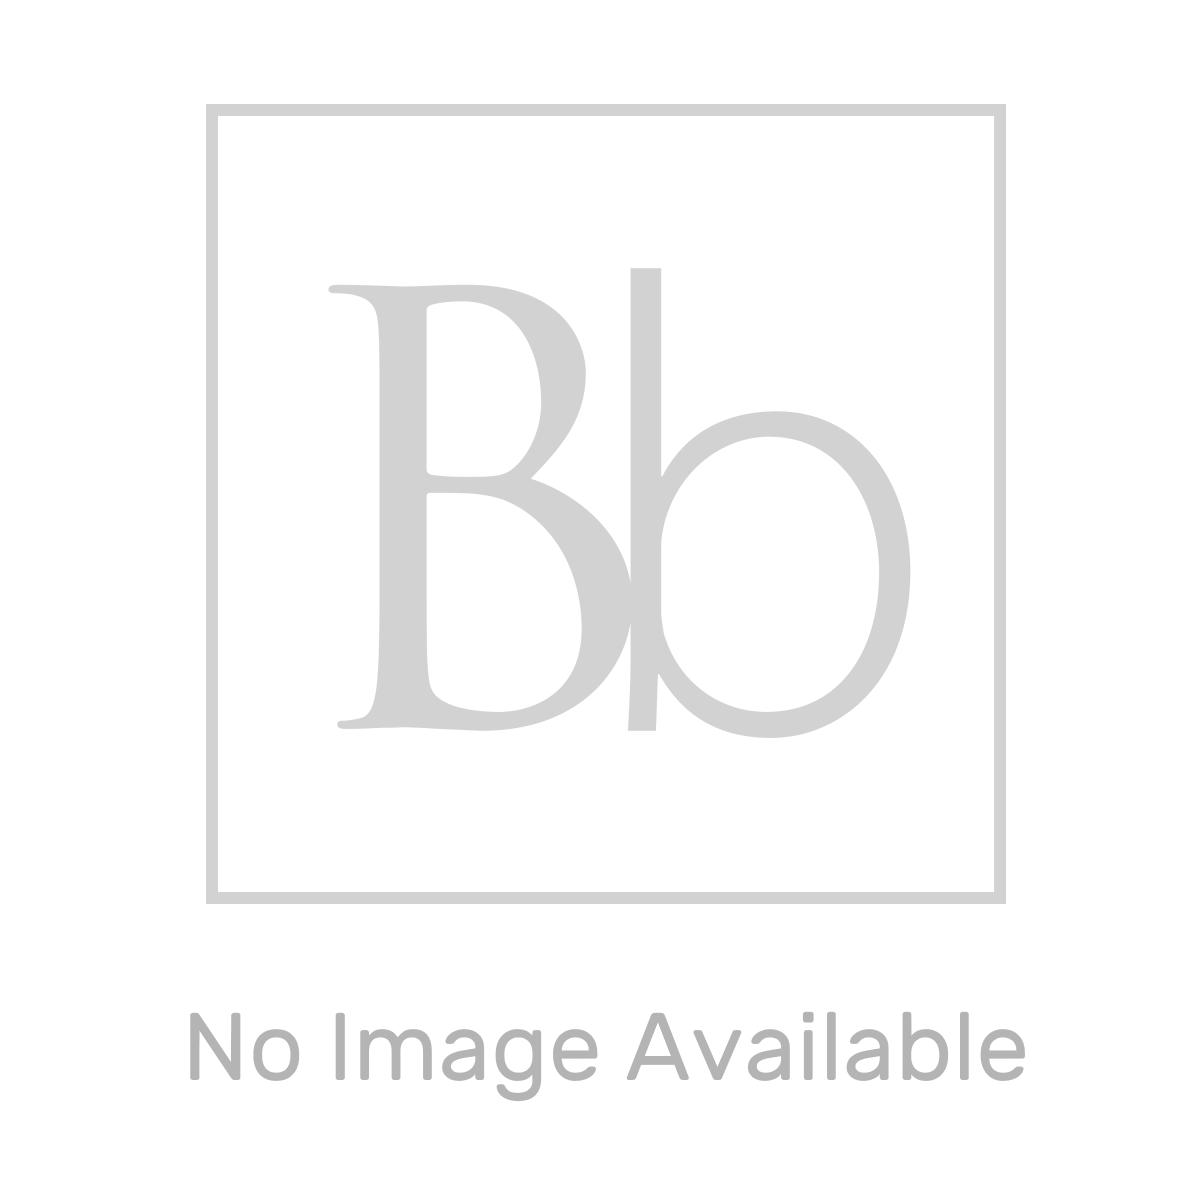 Hudson Reed Art Triple Concealed Thermostatic Shower Valve